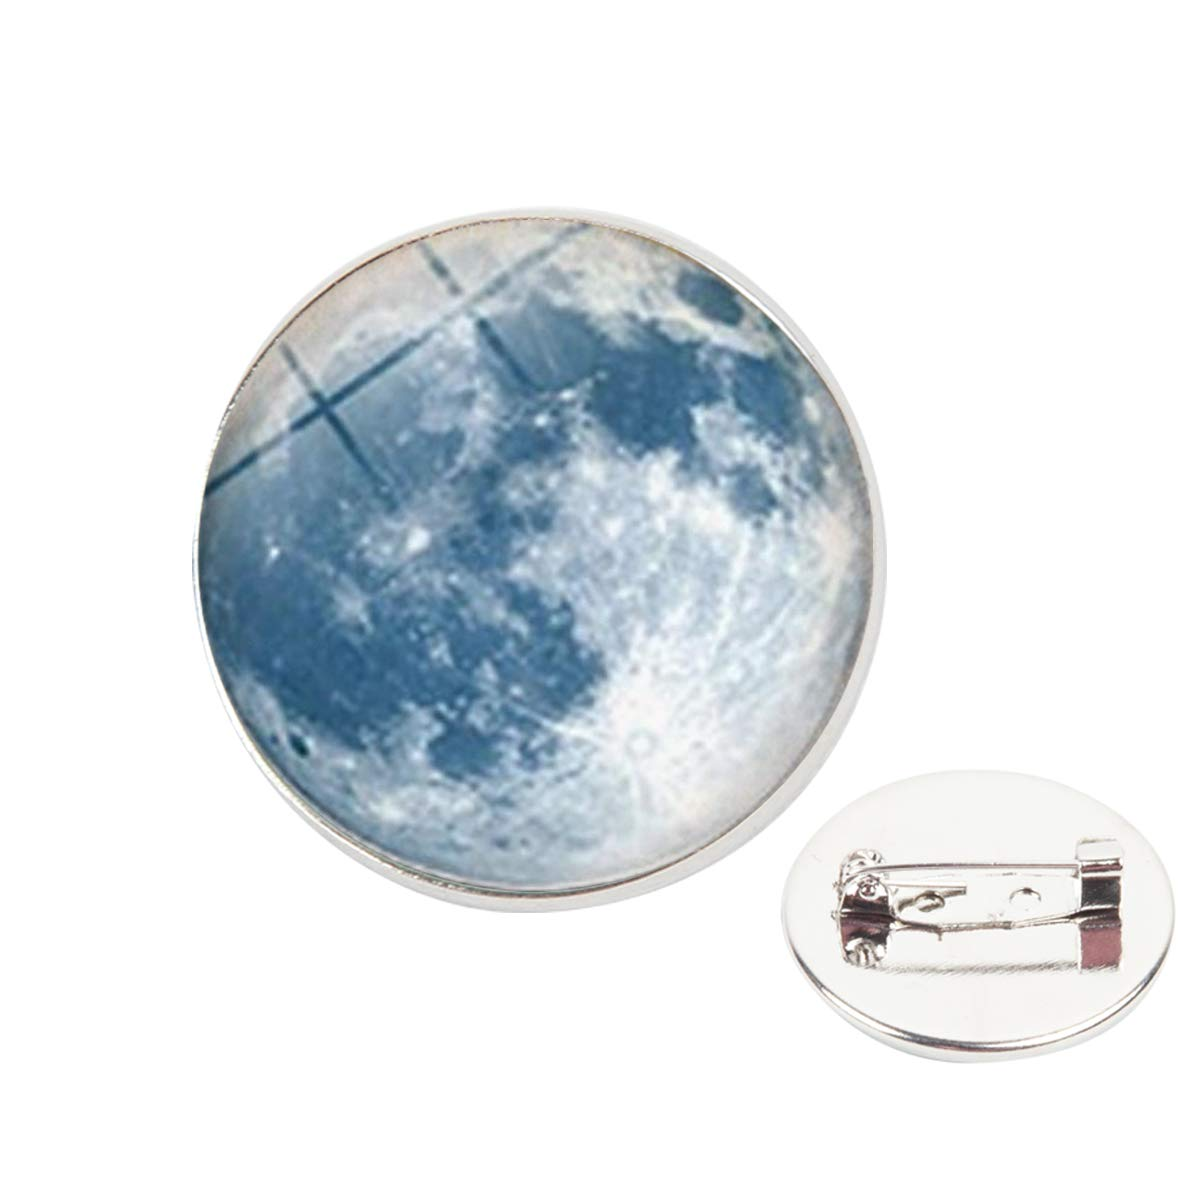 Pinback Buttons Badges Pins Gray Planet Galaxy Moon Lapel Pin Brooch Clip Trendy Accessory Jacket T-Shirt Bag Hat Shoe